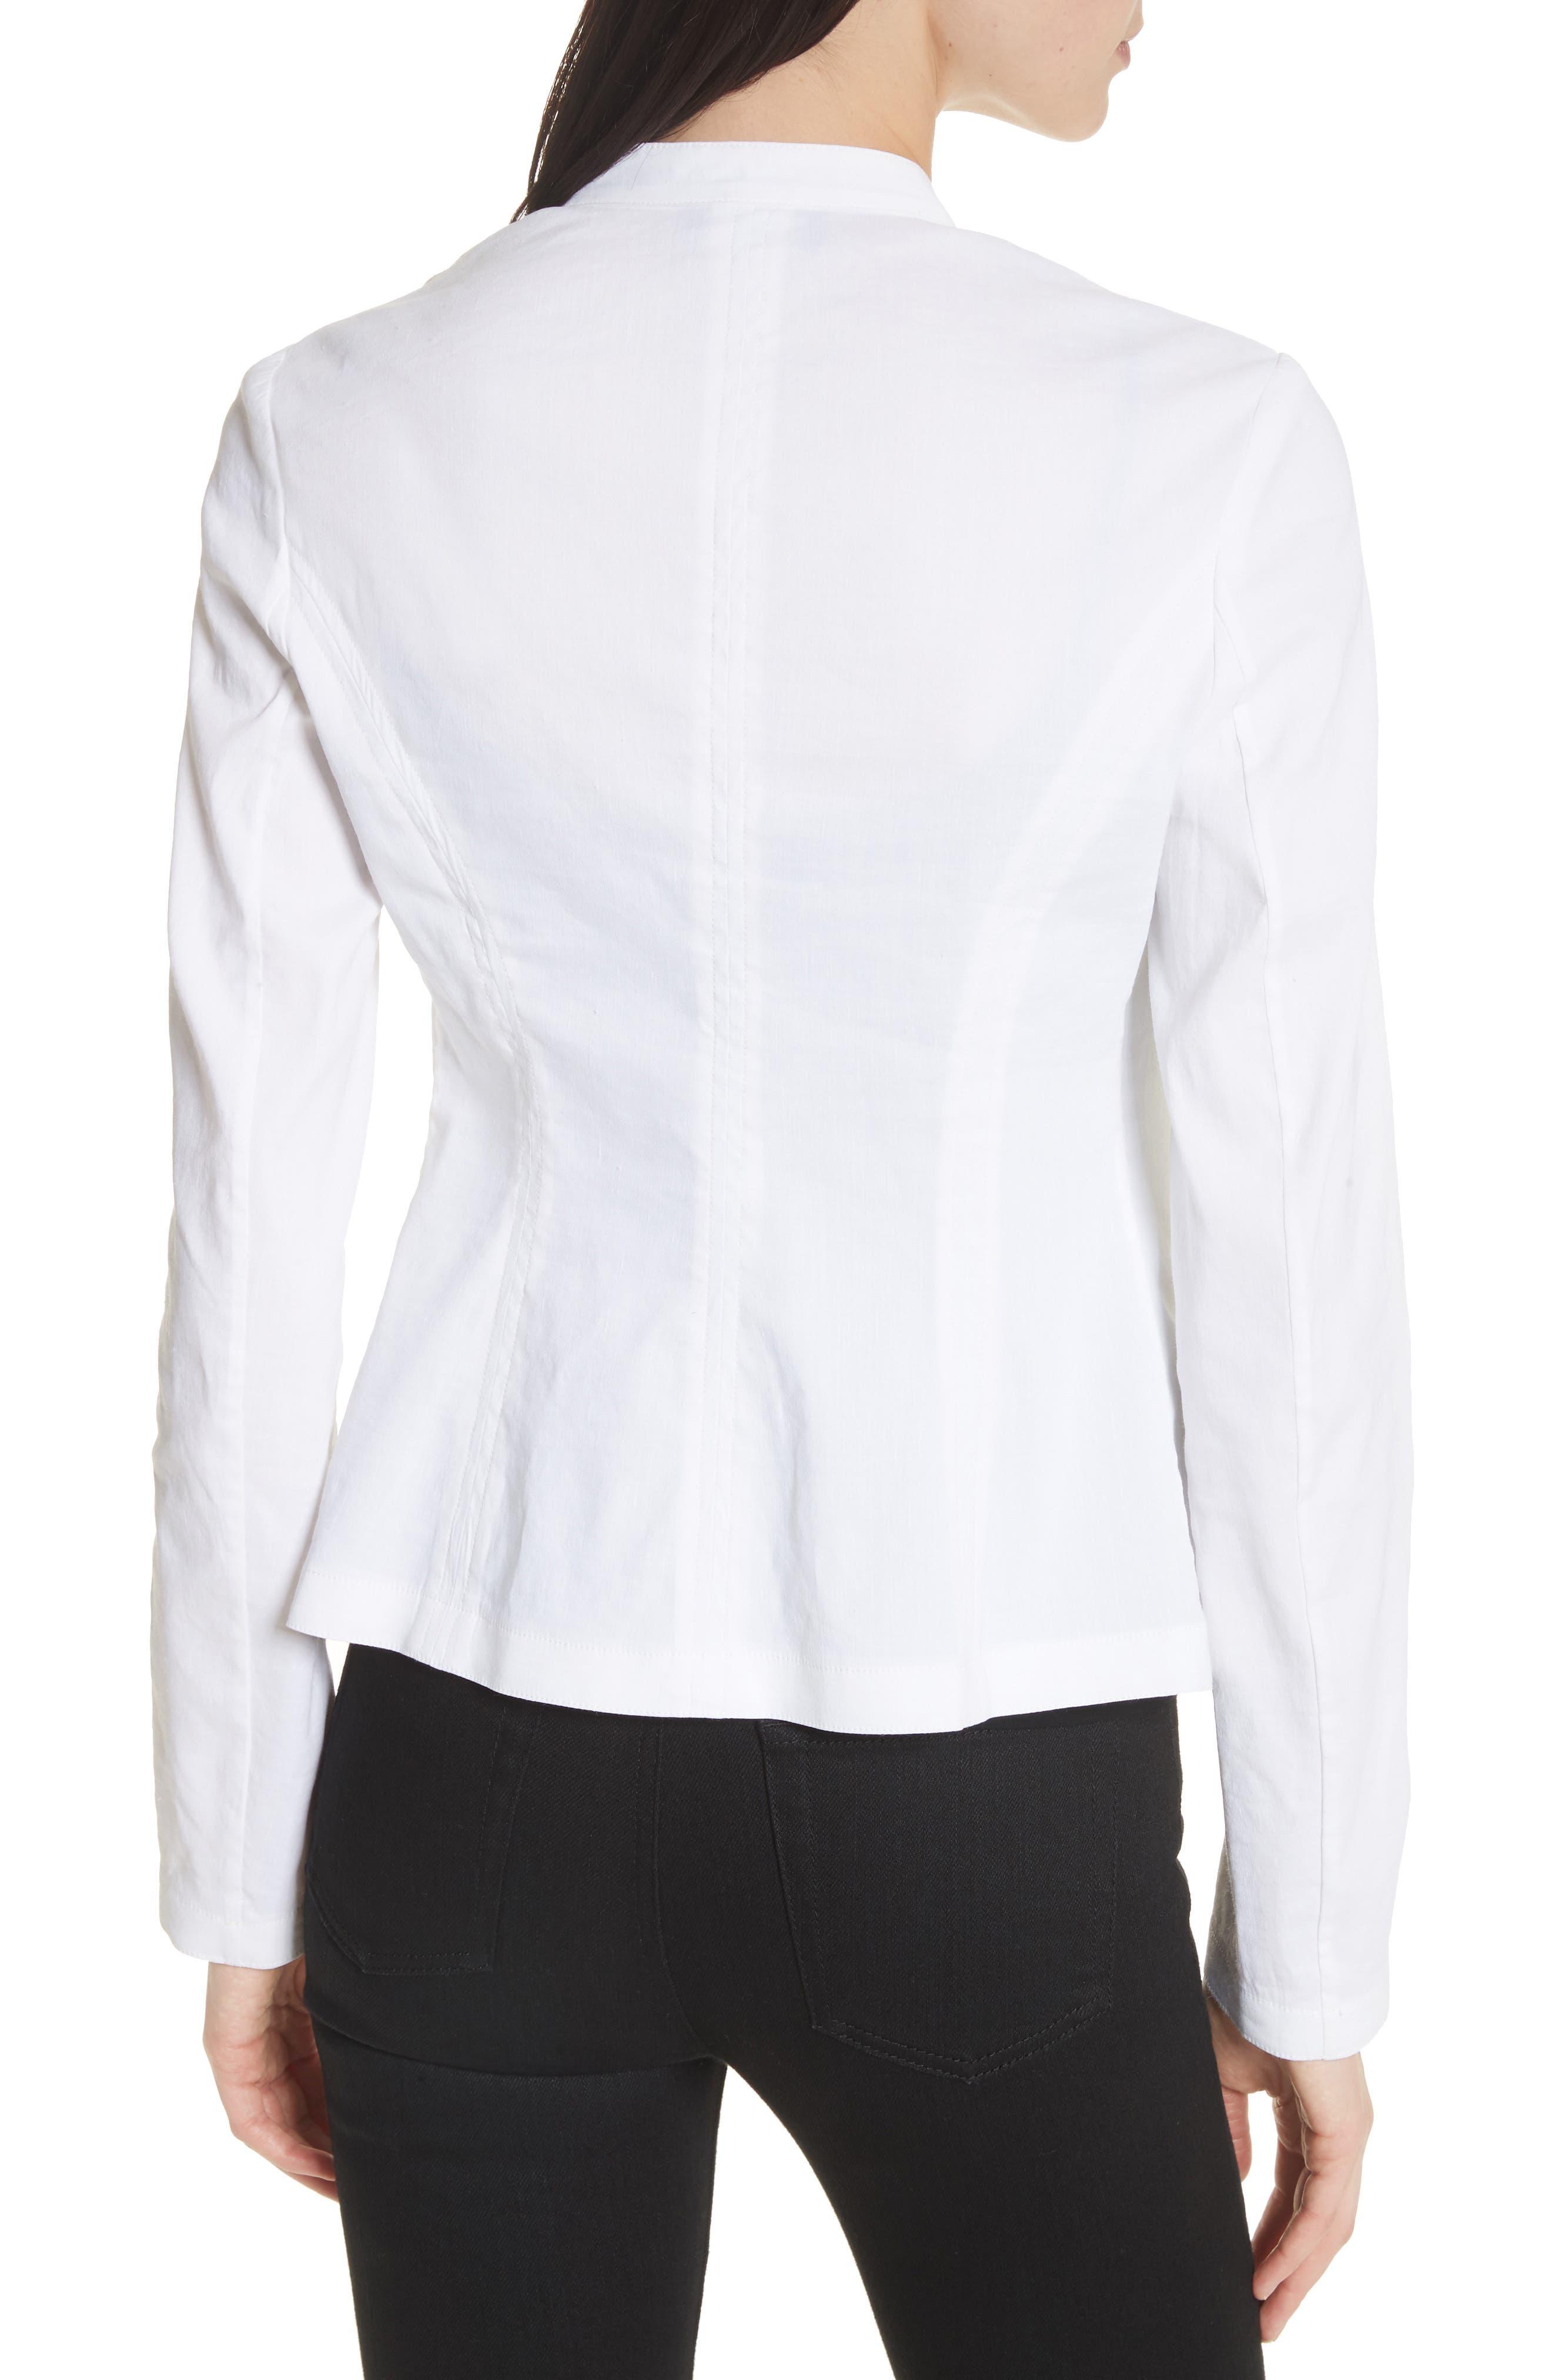 Clean Linen Blend Blazer,                             Alternate thumbnail 2, color,                             White